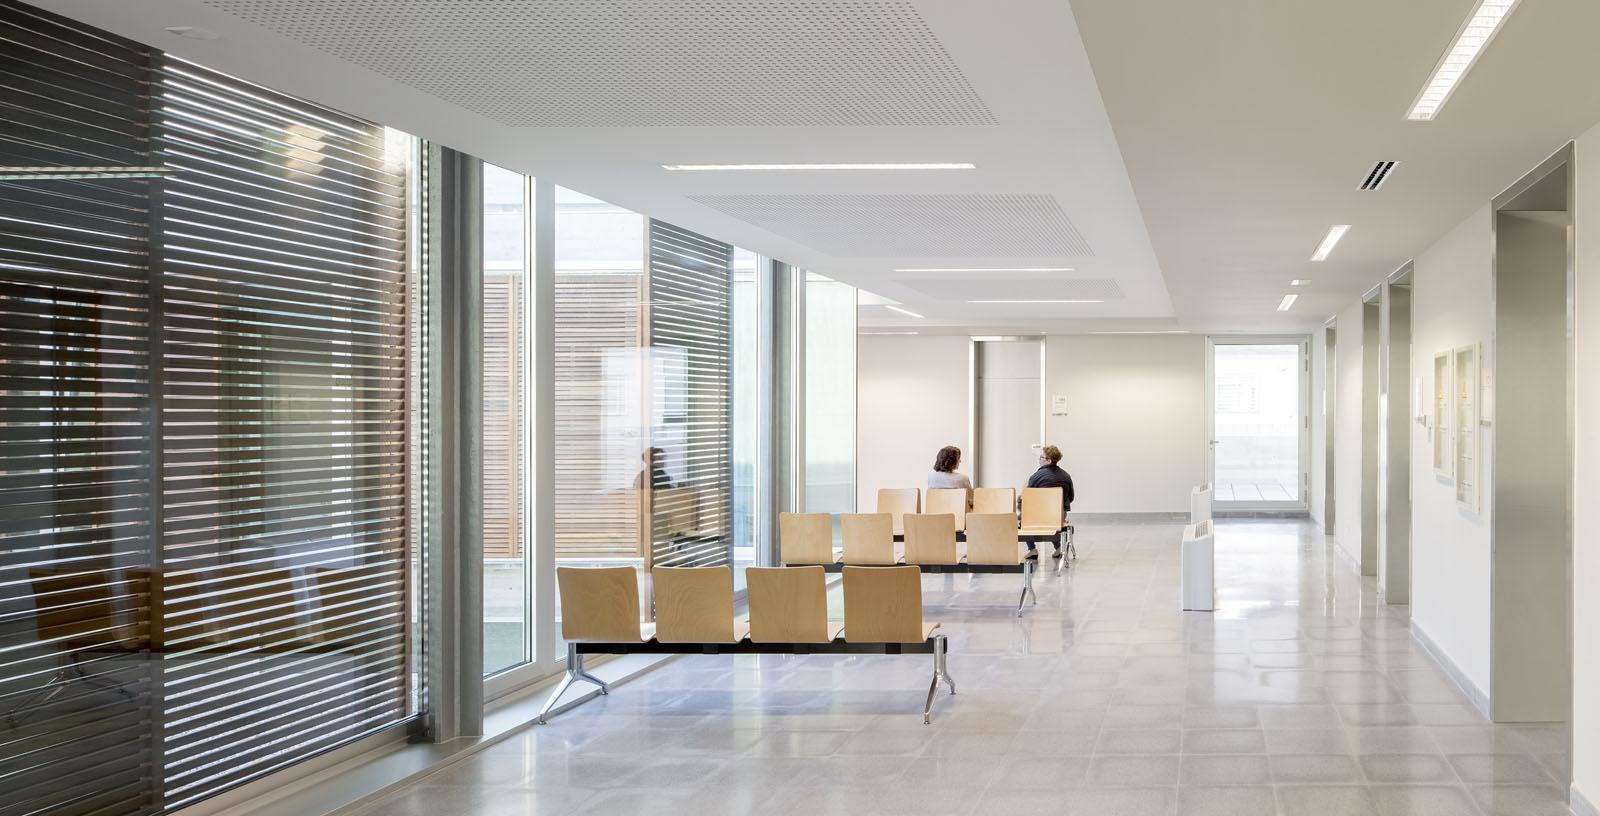 Valenza__Health_Center_002_Architecture_IDOM_Copyright_Aitor_Ortiz